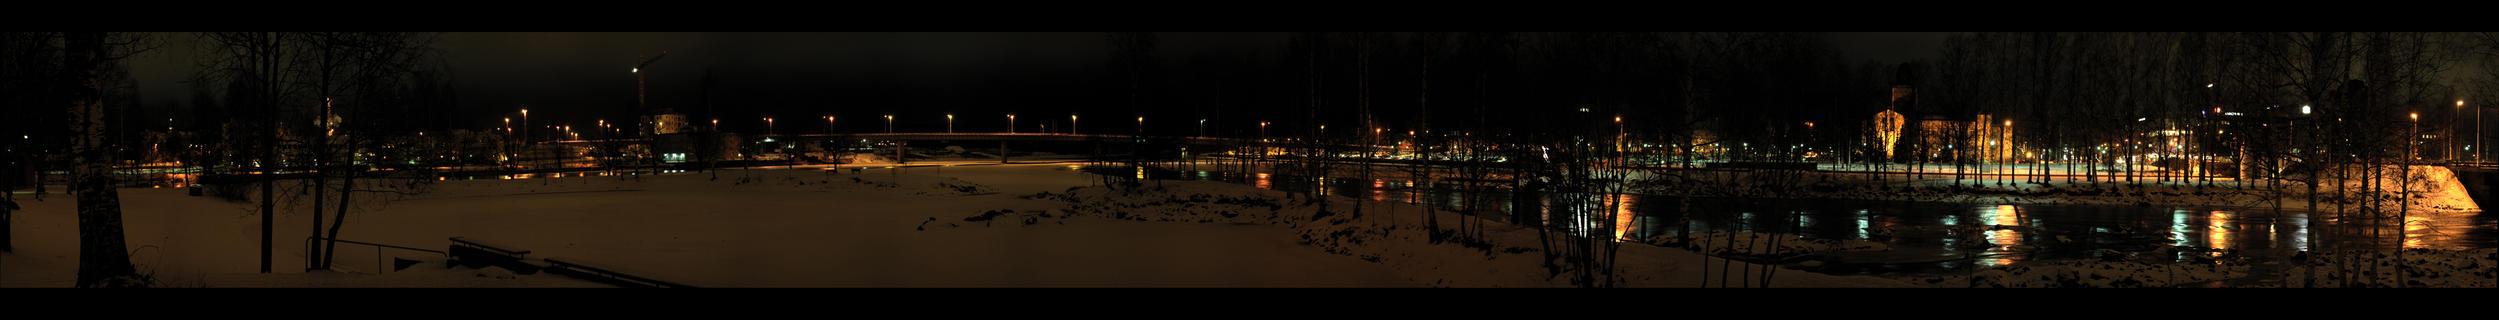 City Lights Panorama by DeviantPunisher